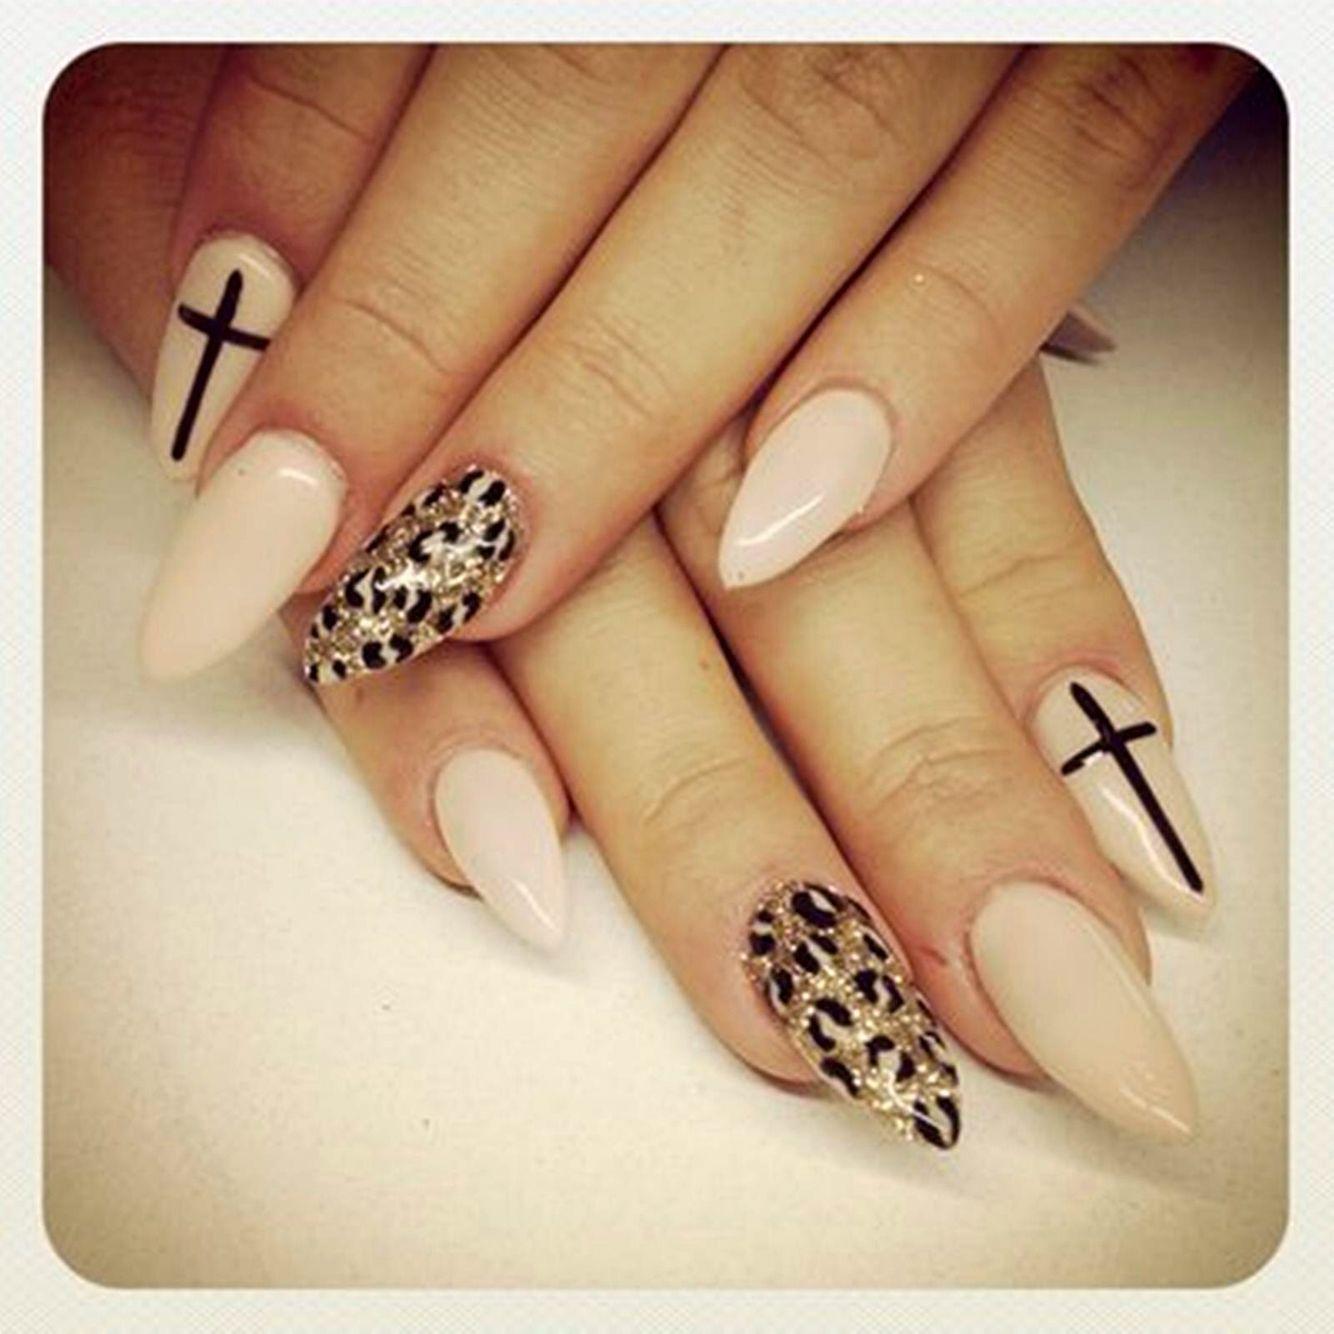 Cheetah nude cat acrylic nails   Nails   Pinterest